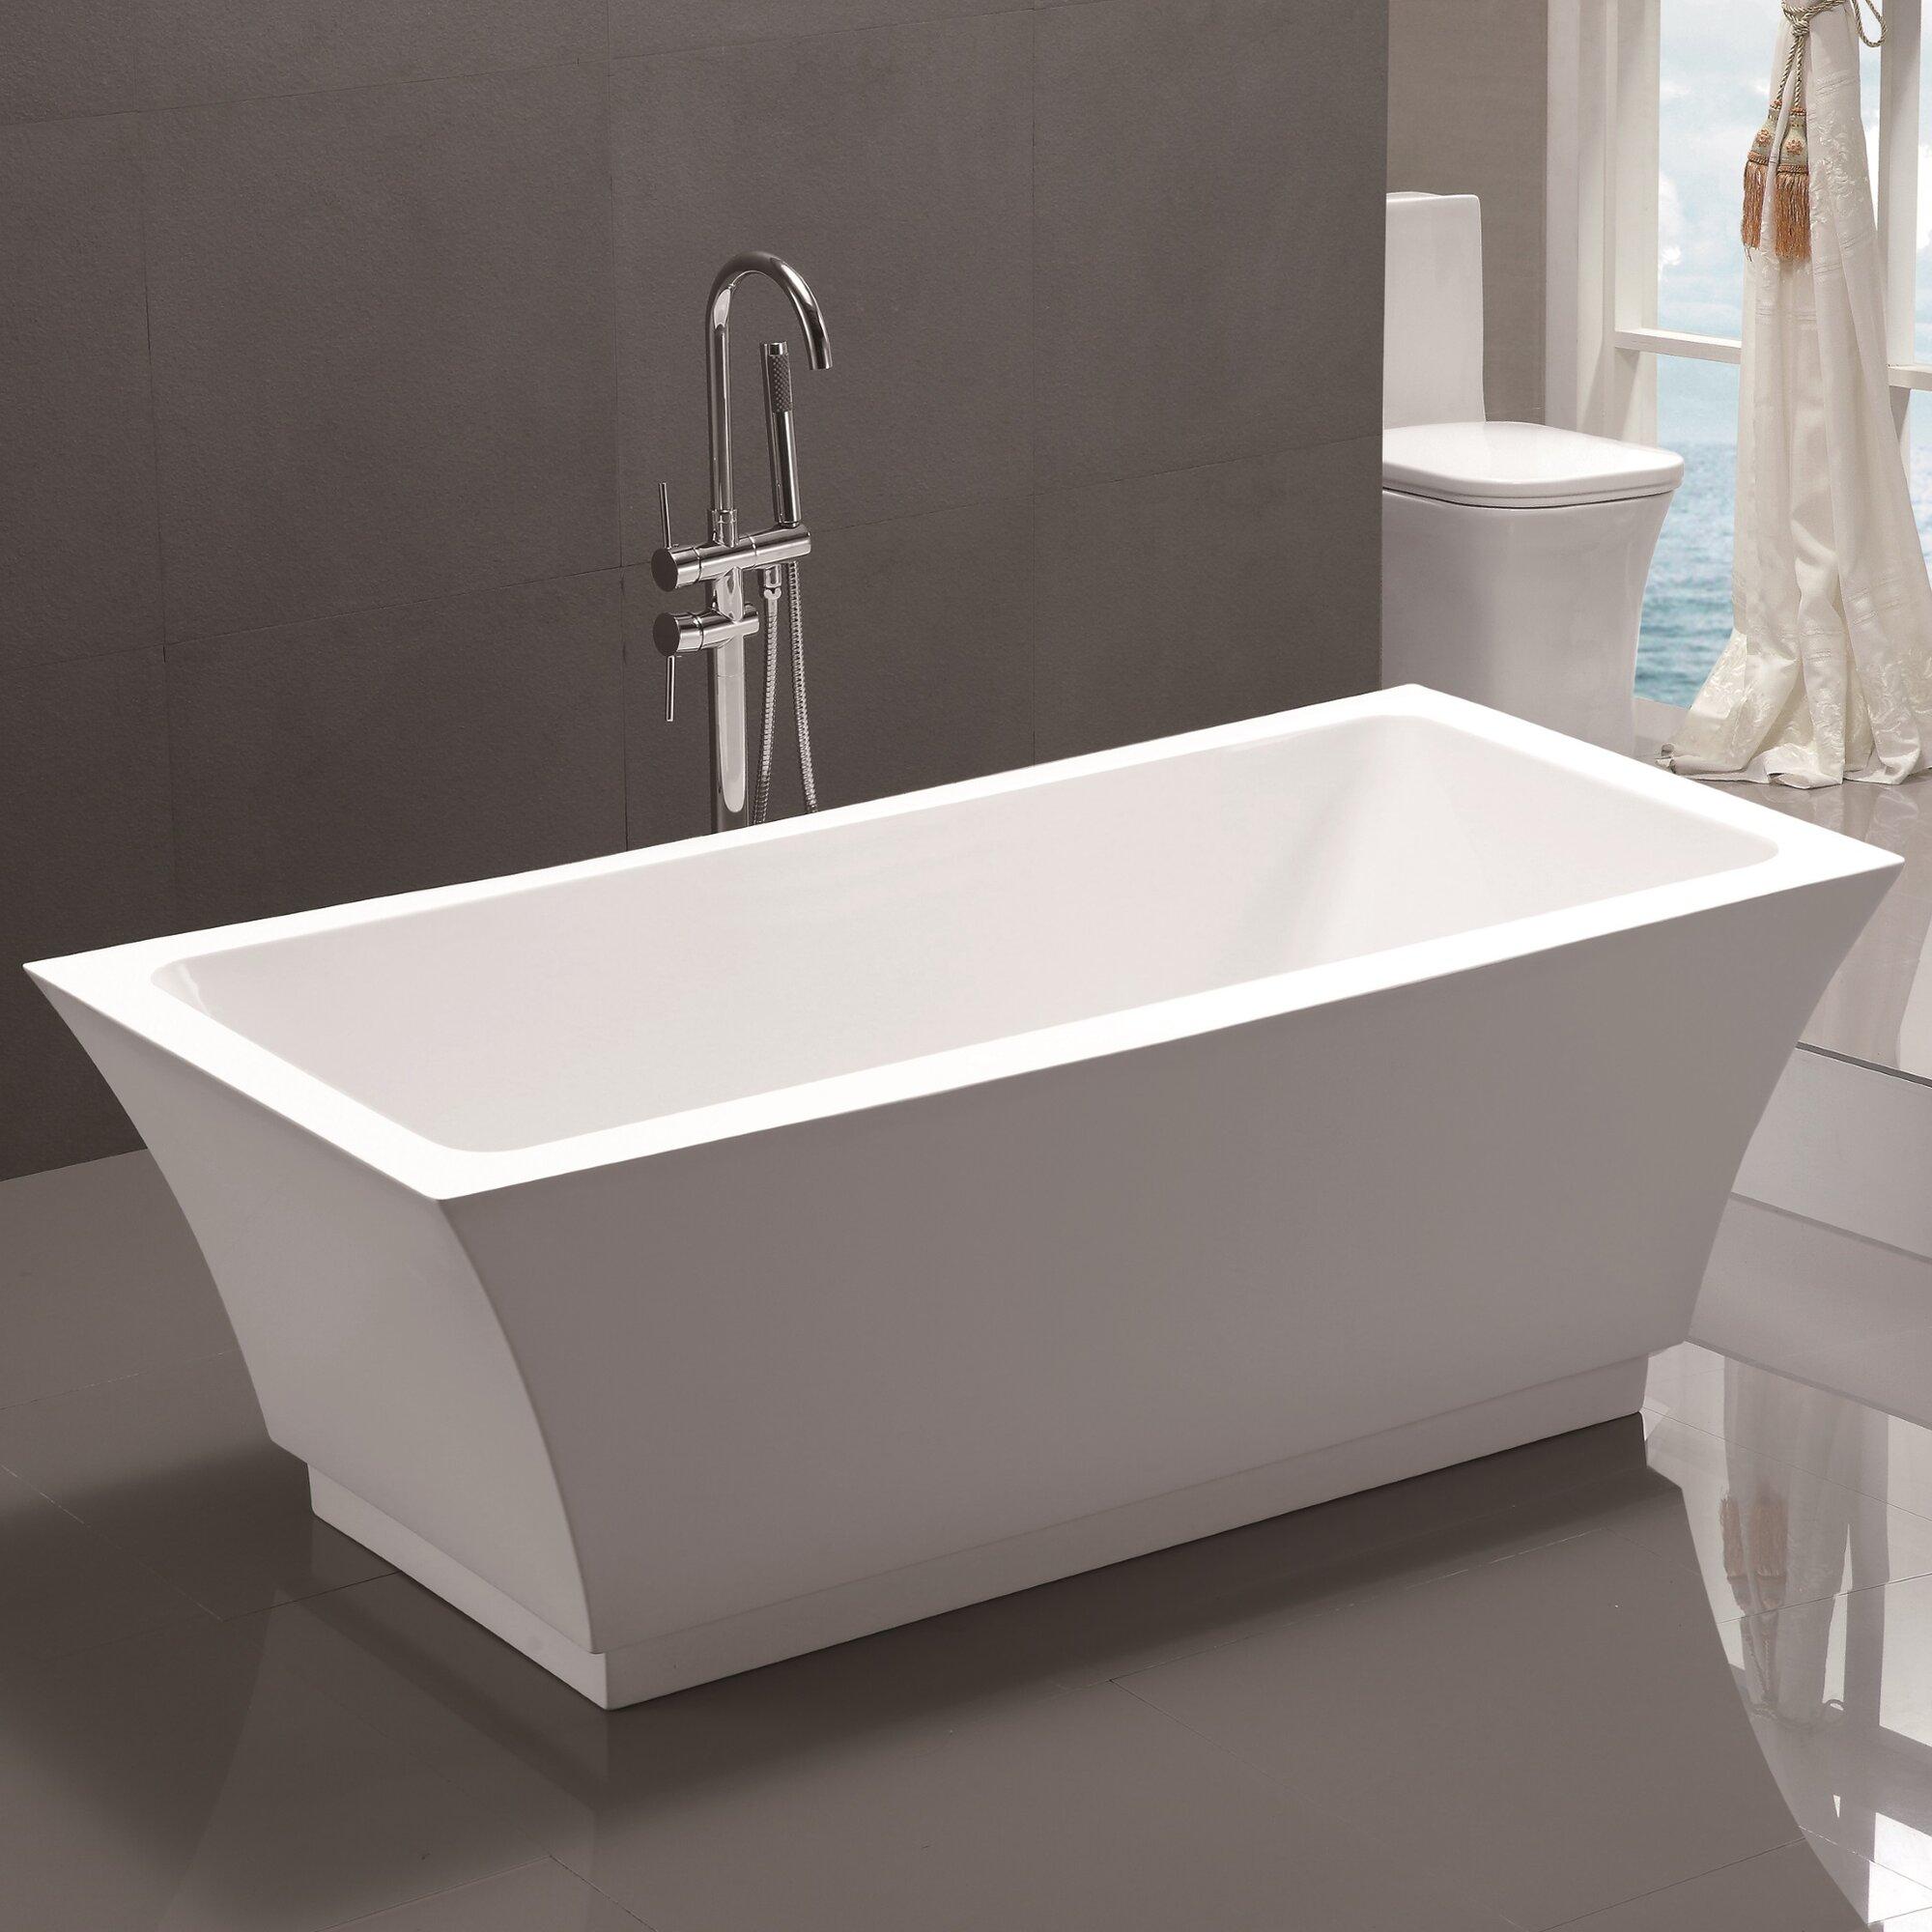 "Vanity Art 59"" X 29.5"" Freestanding Soaking Bathtub"